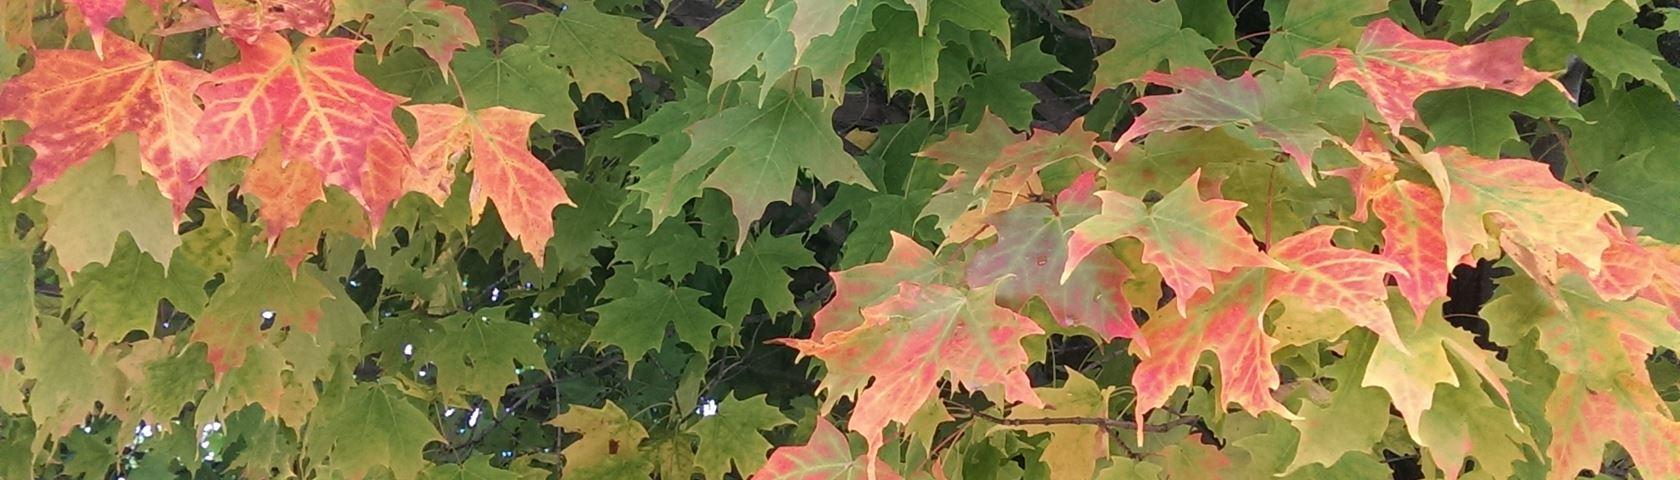 Vermont Autumn Leaves